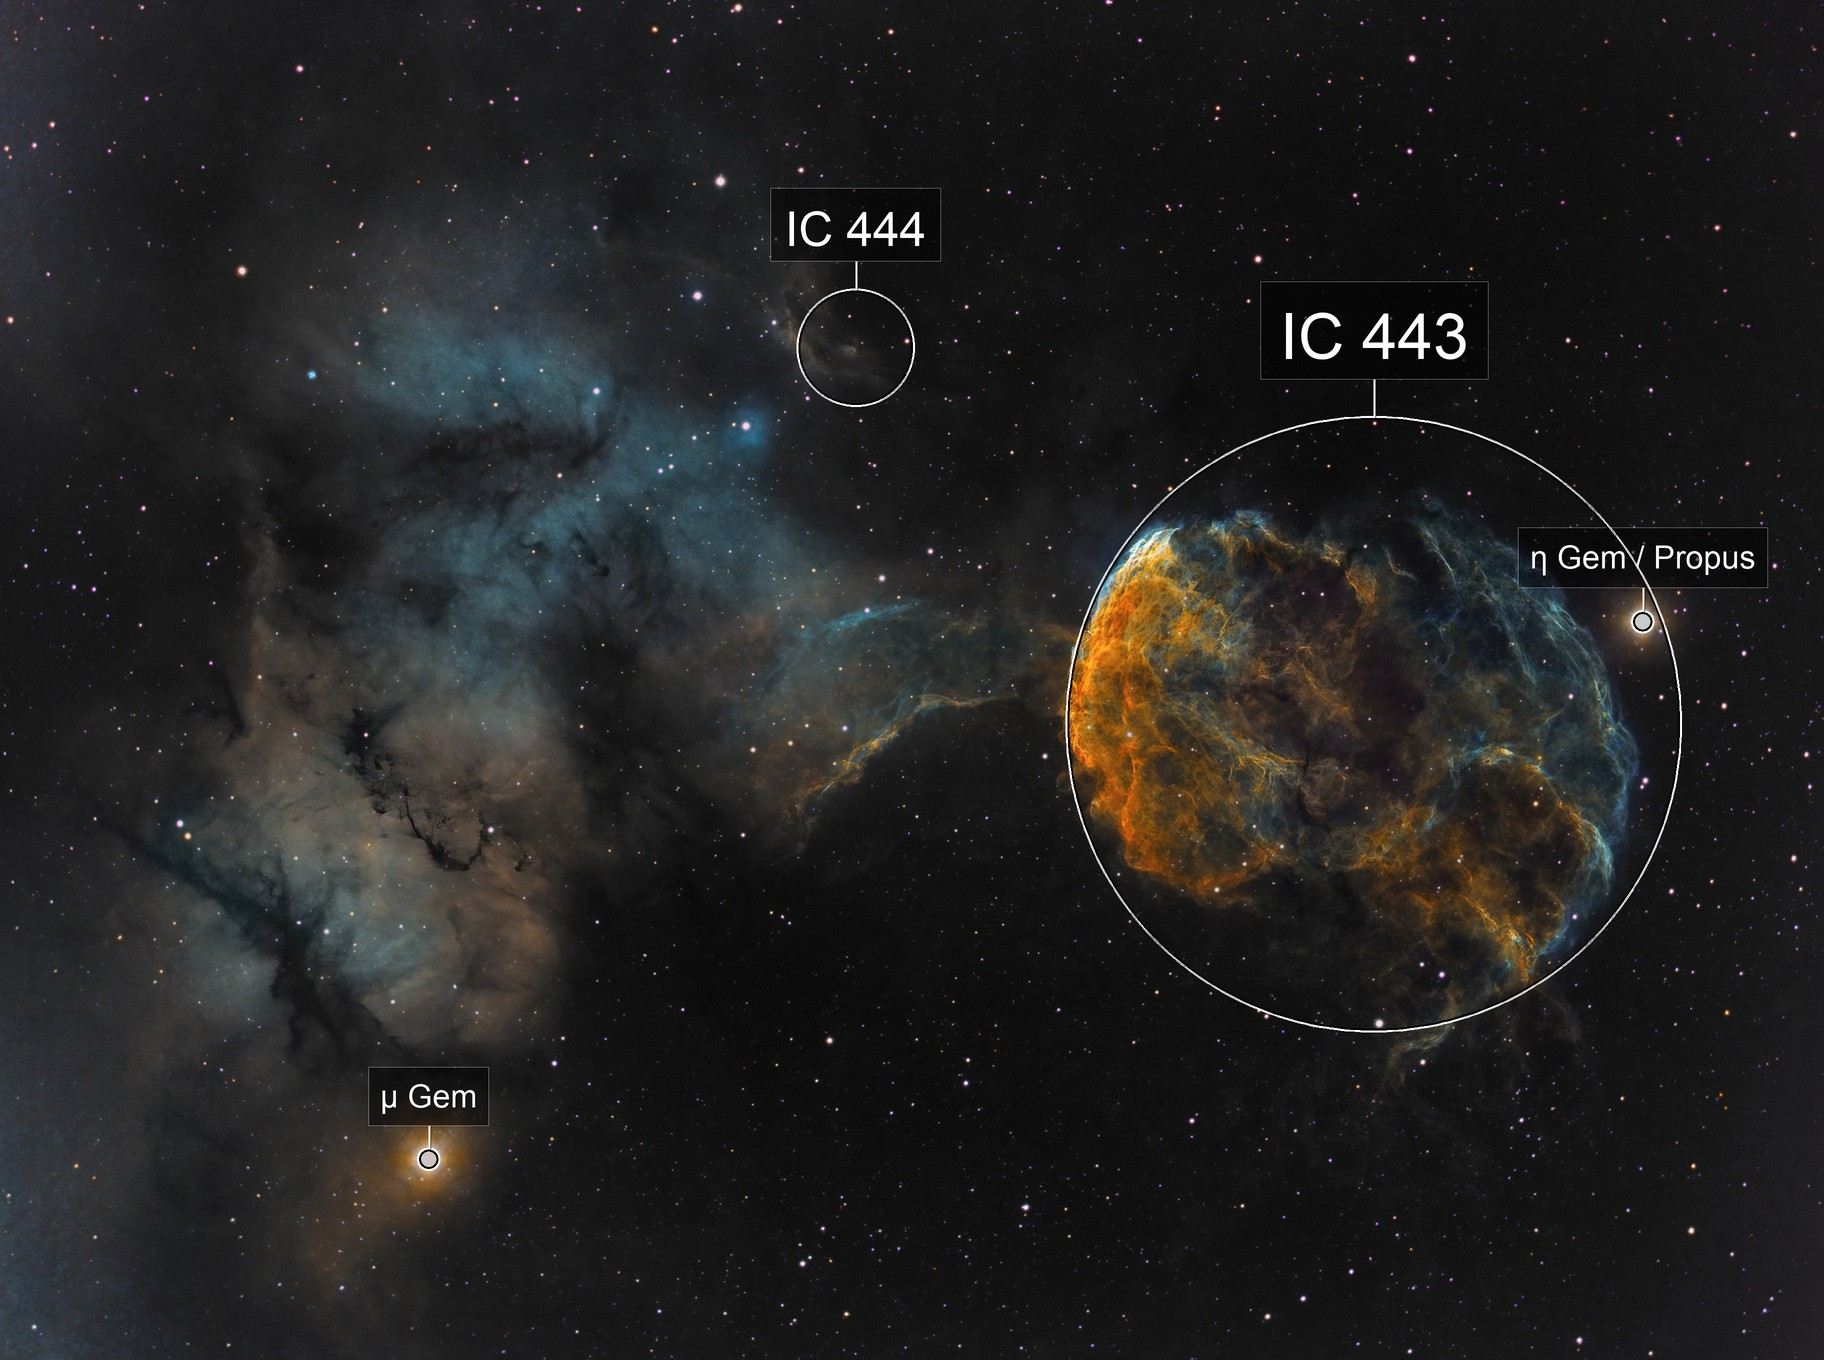 The Jellyfish Nebula - IC 443 and surrounding IC 444